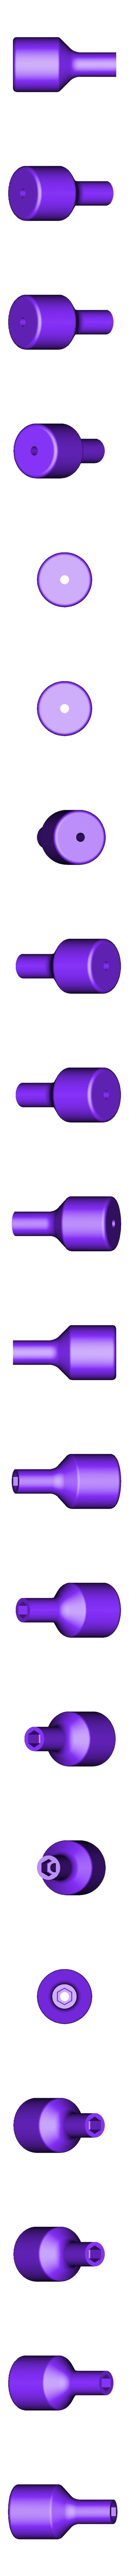 clé jante 101 11.STL Download STL file AXIAL SCX24 Trail Grappler M/T rim offset 7mm military type • 3D printable template, lulu3Dbuilder